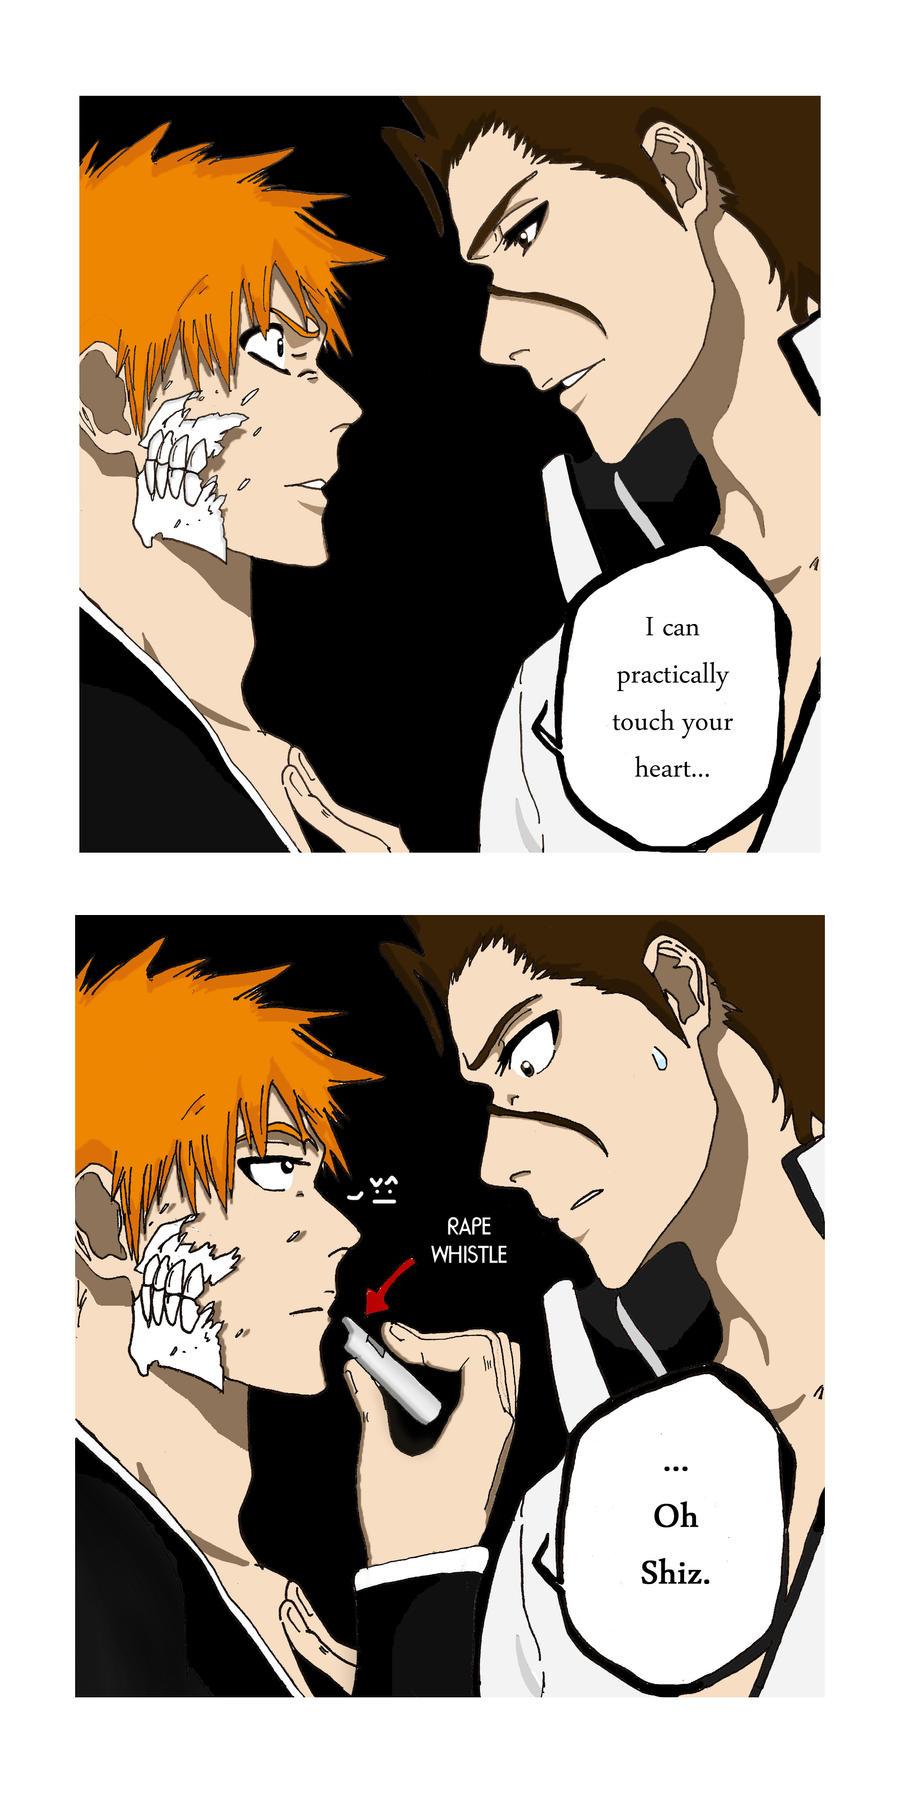 Ridiculous image thread bleach style page 317 animesuki forum